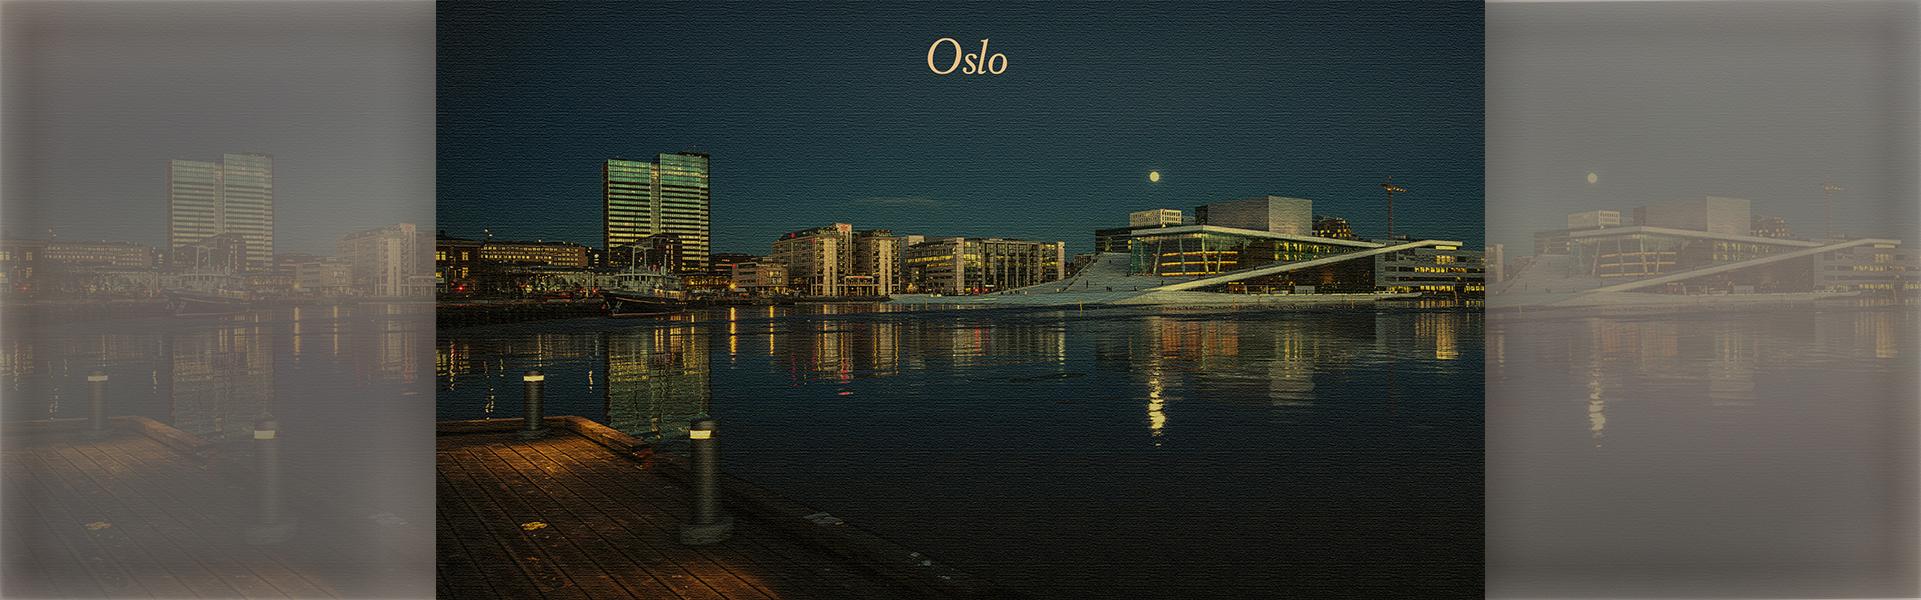 Oslo 5new слайдер 3